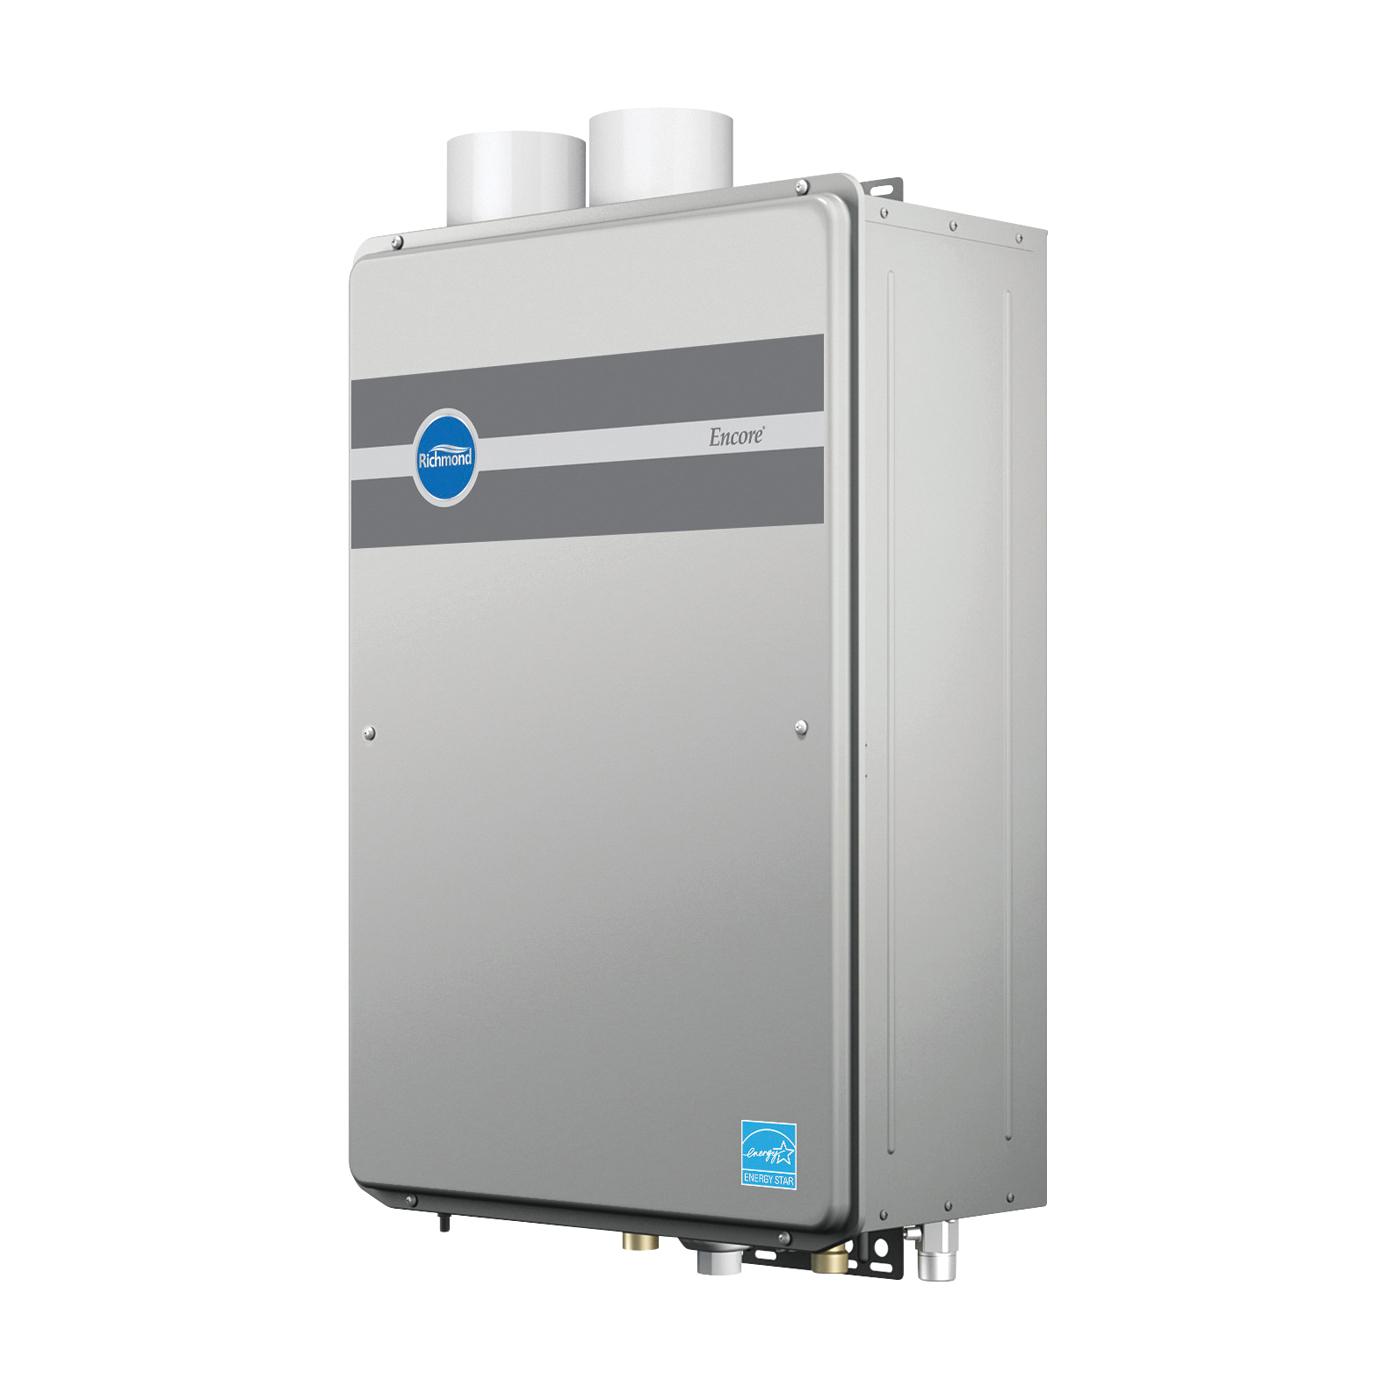 Picture of Richmond Encore RMTGH-95DVLP-1 Gas Water Heater, Propane, 11000 to 199900 Btu/hr BTU, 0.93 Energy Efficiency